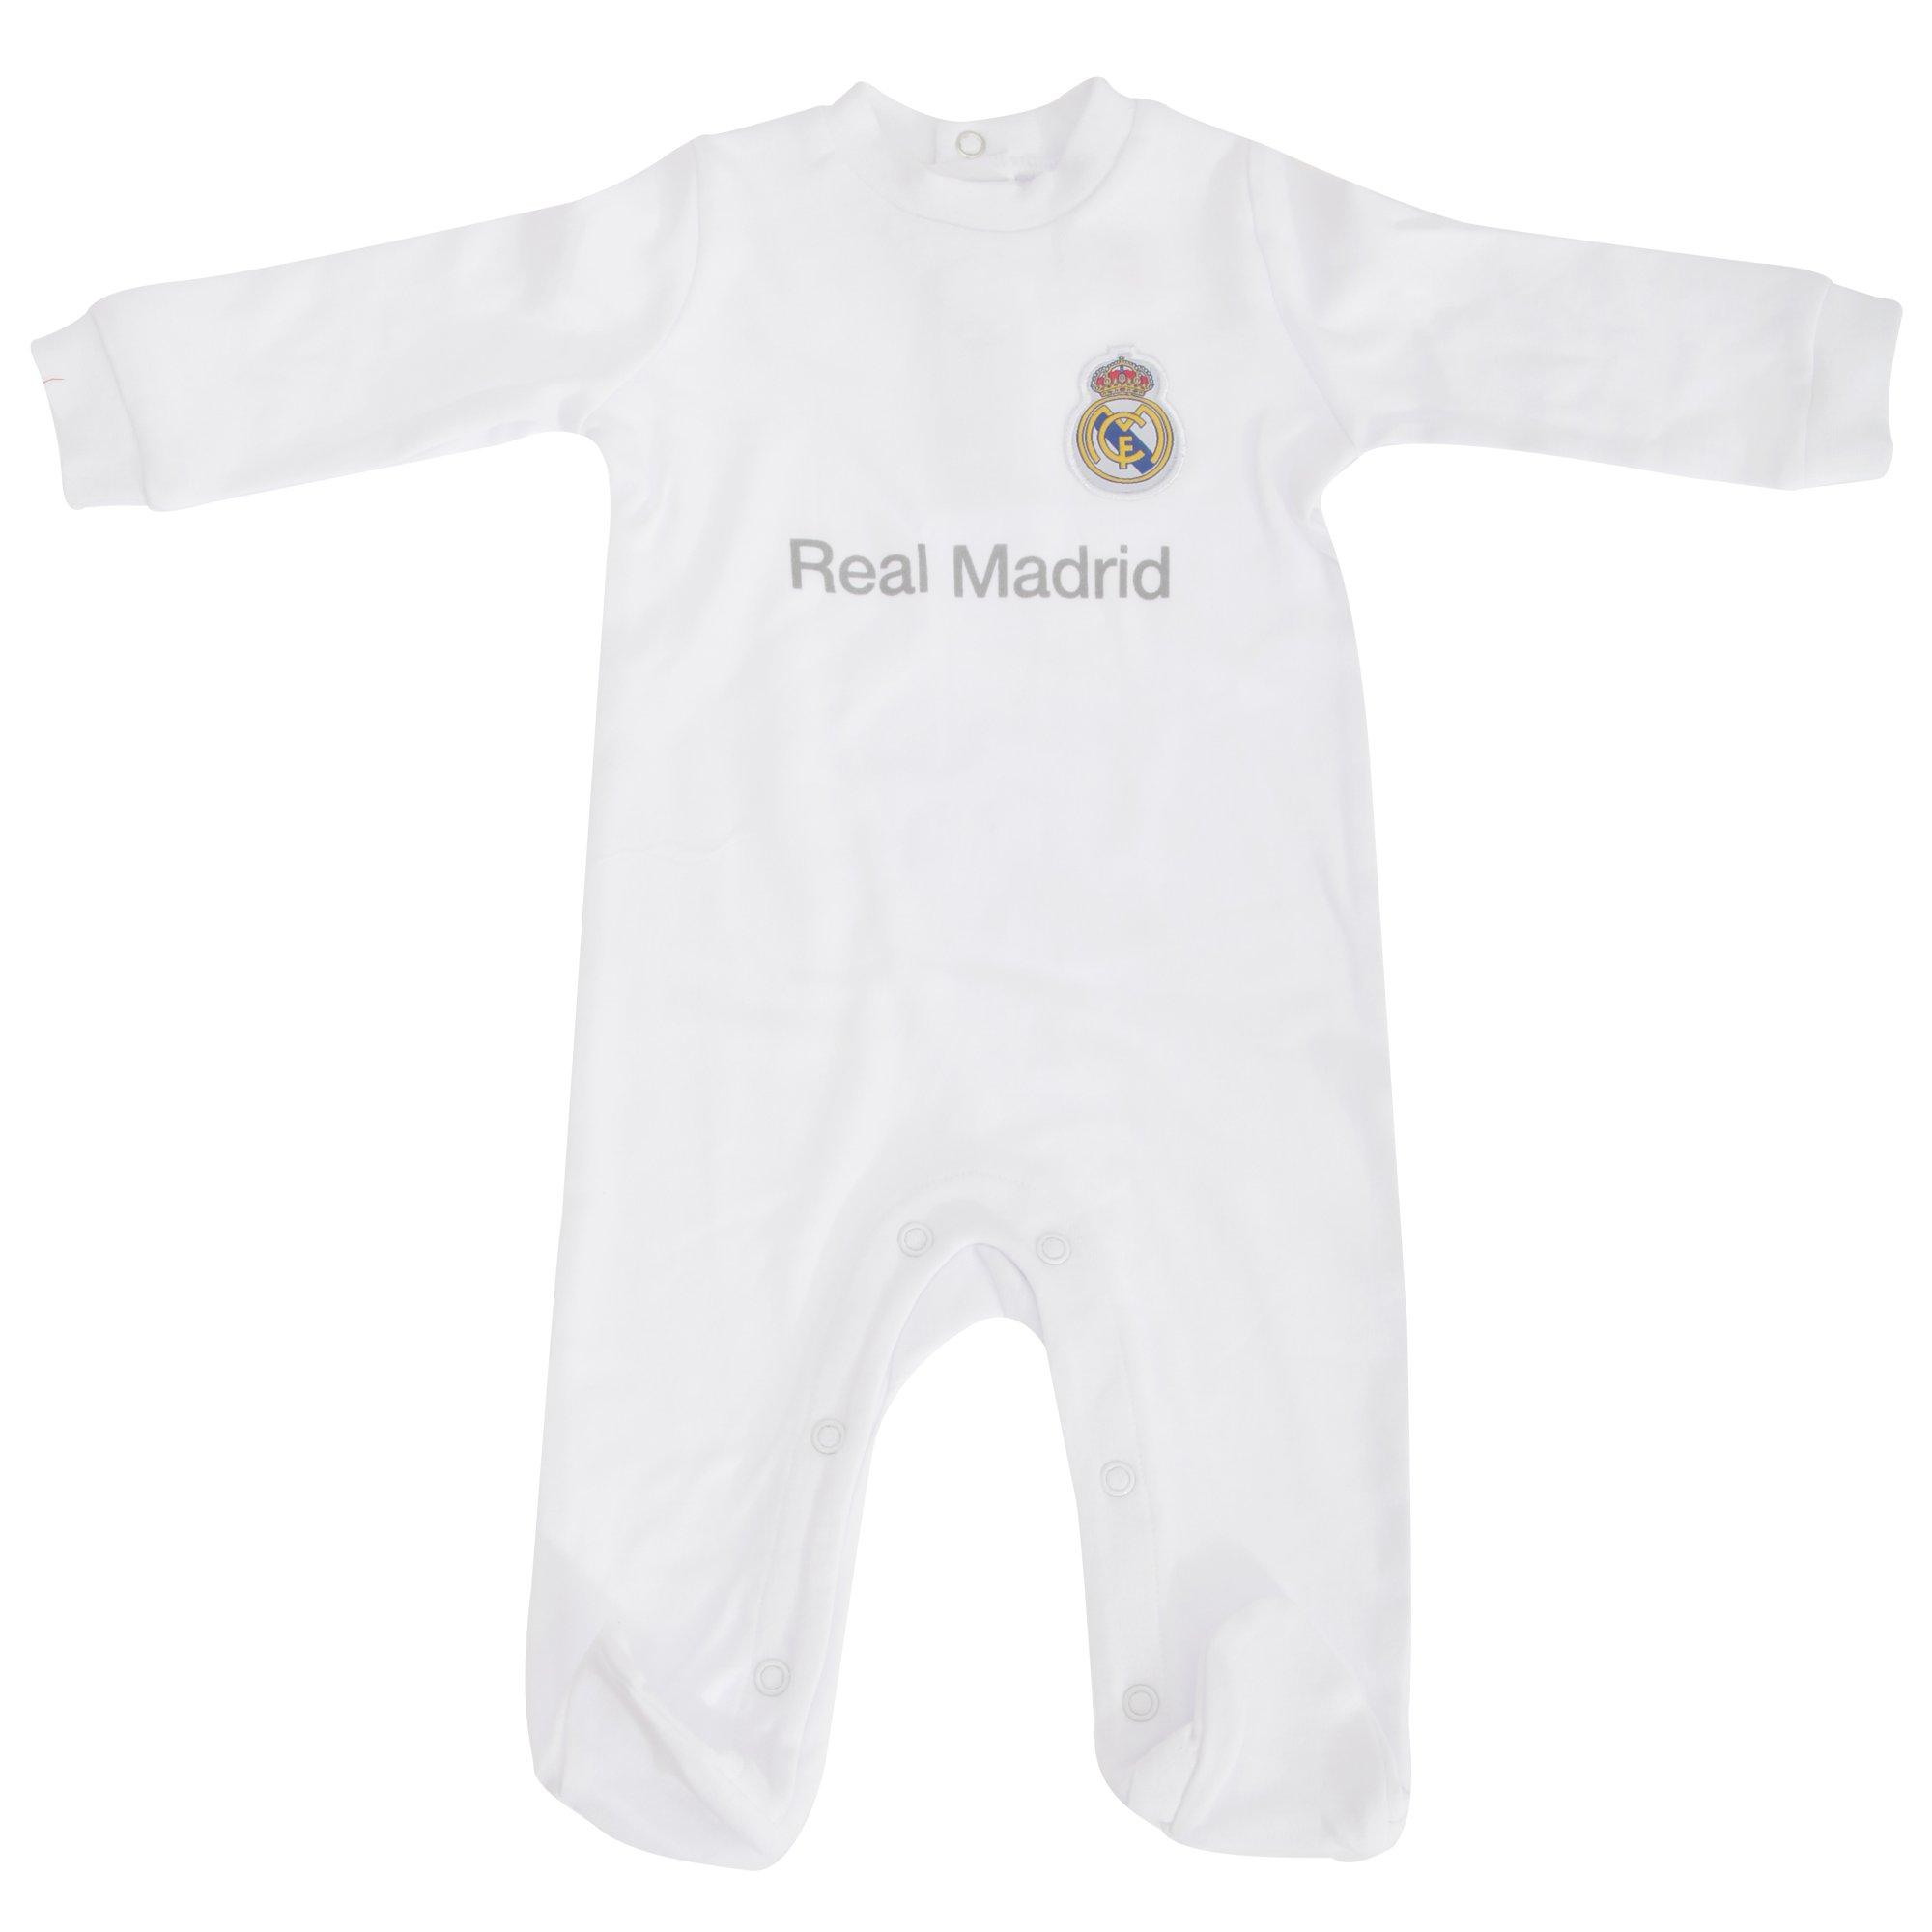 Real Madrid CF Baby Strampler mit Club Wappen (3-6 Monate) (Weiß) Misc. Brecrest B016EWGA6U RM001